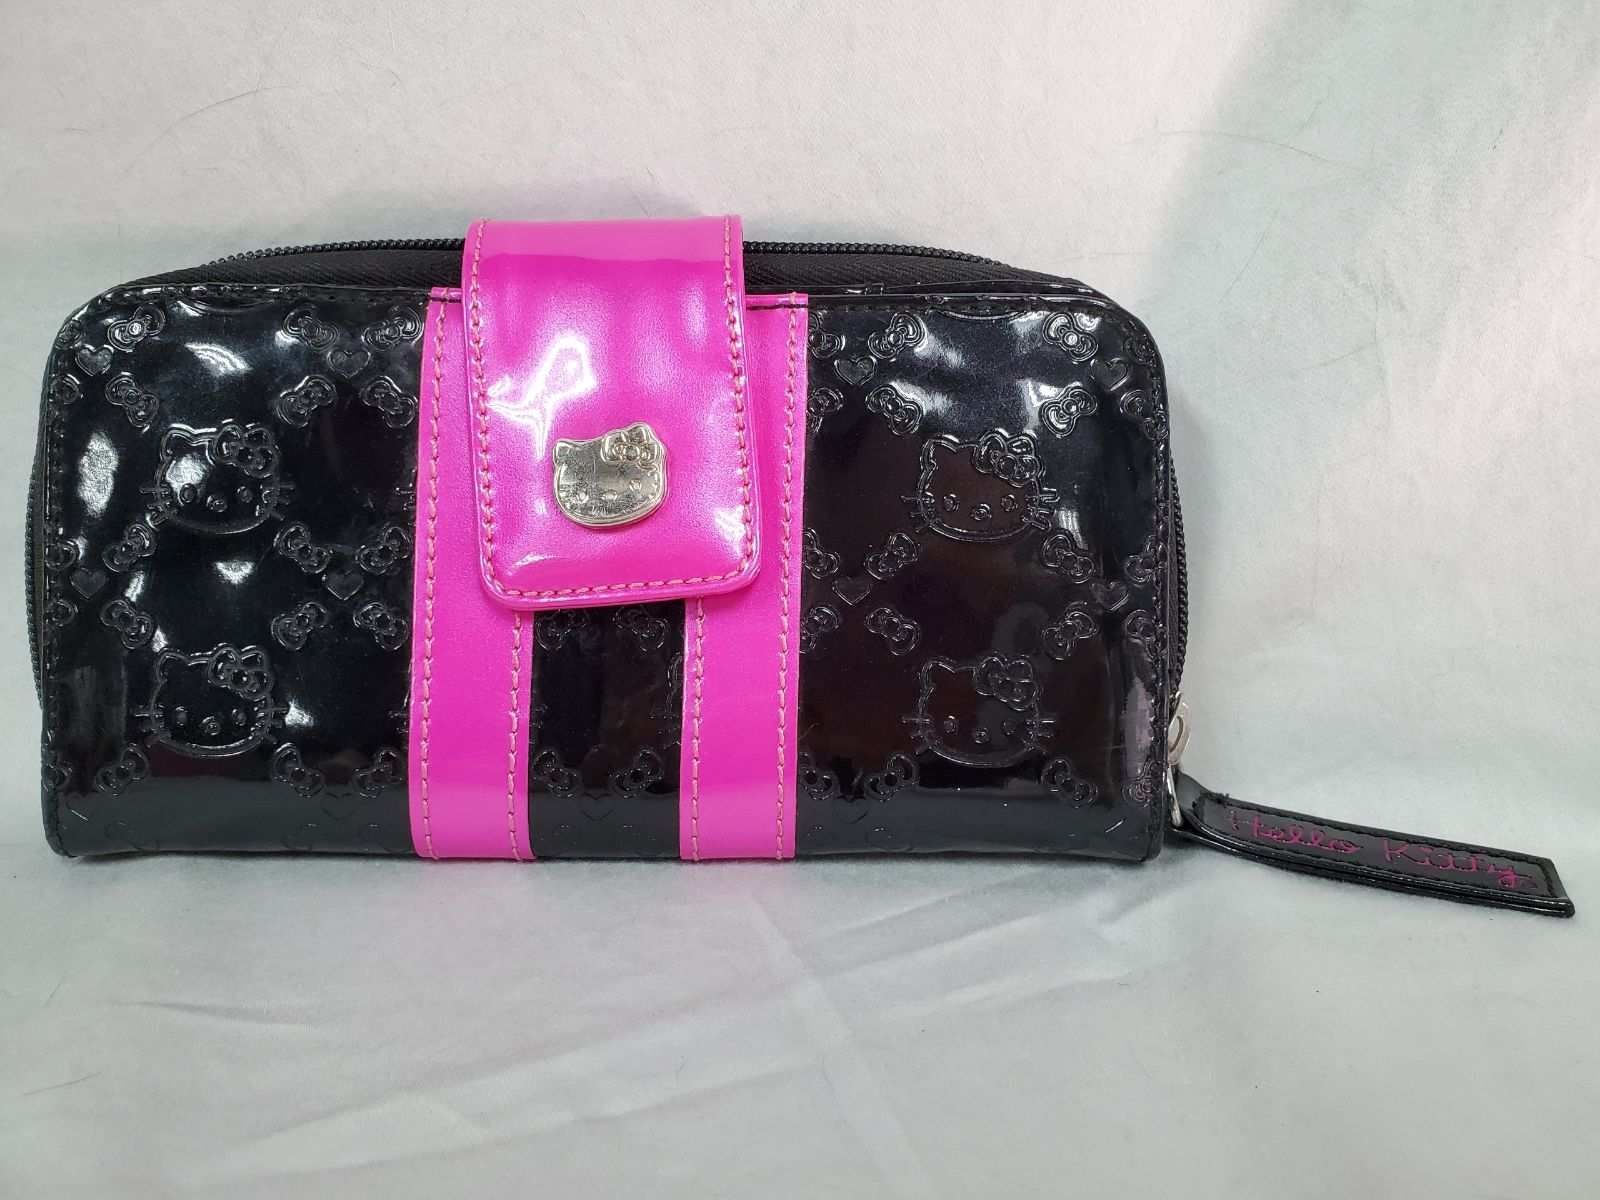 Disney Loungefly Hello Kitty Wallet